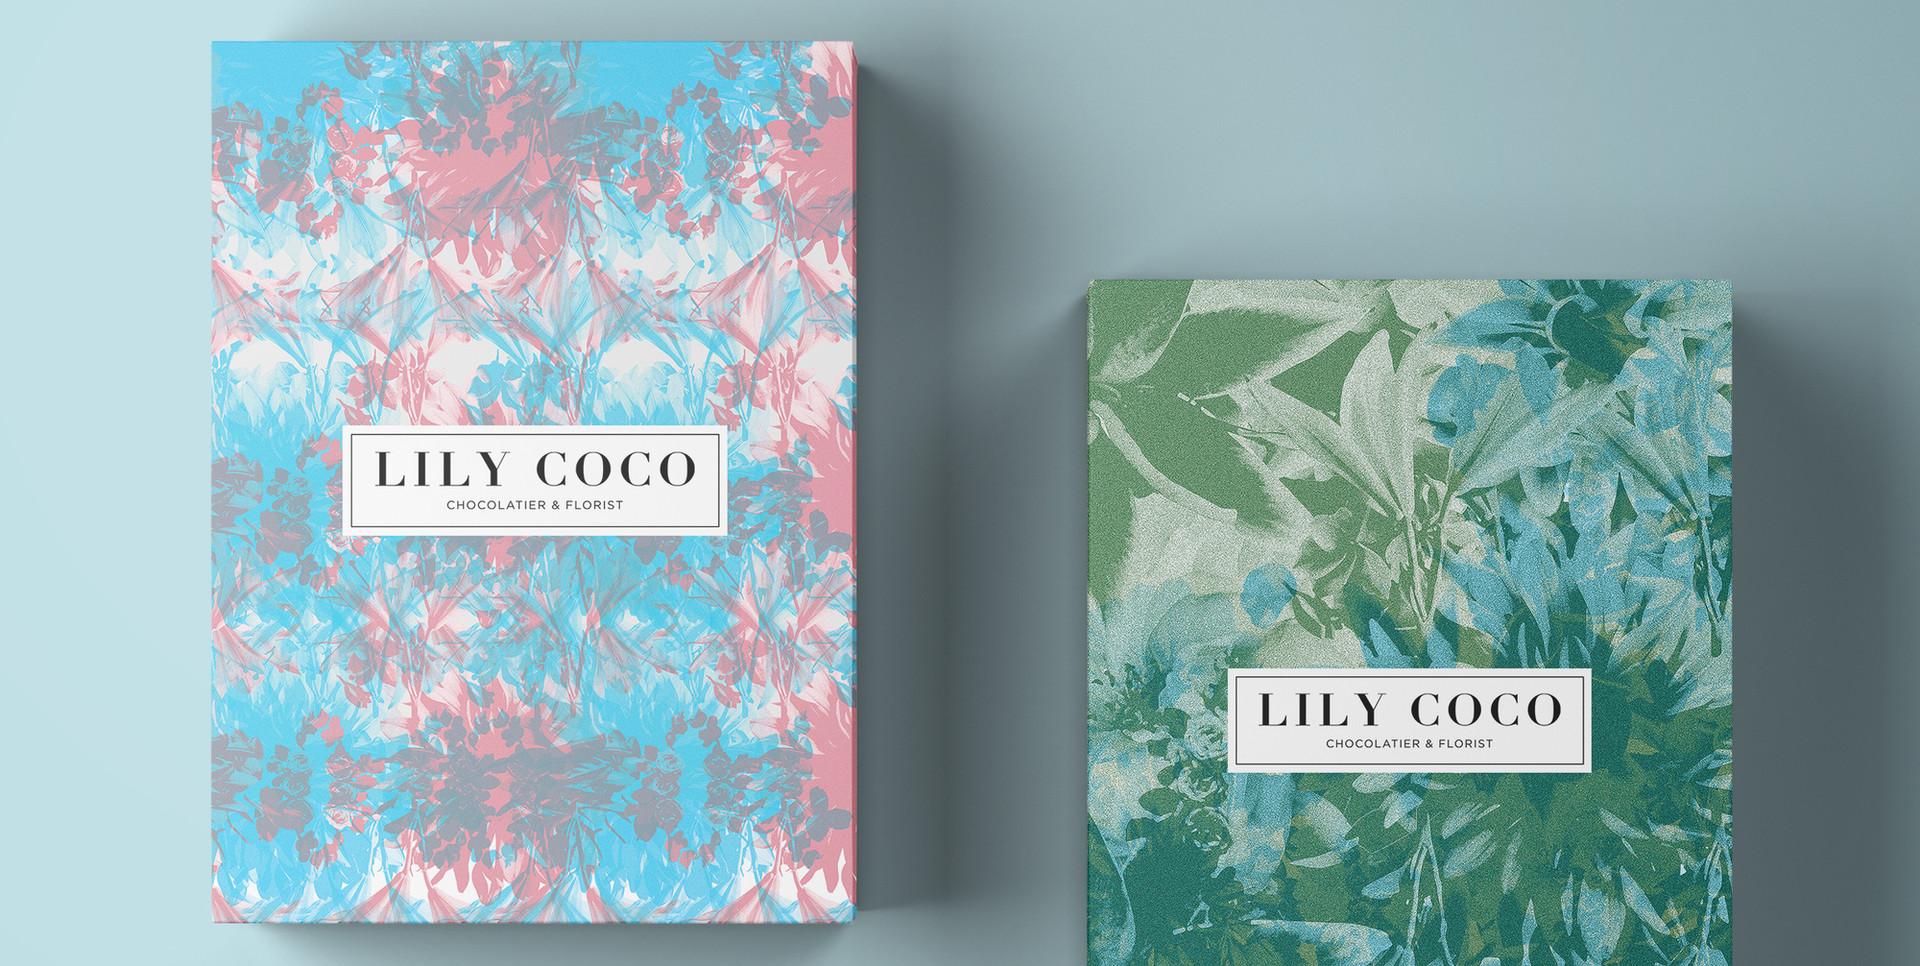 lily coco beha 1.jpg